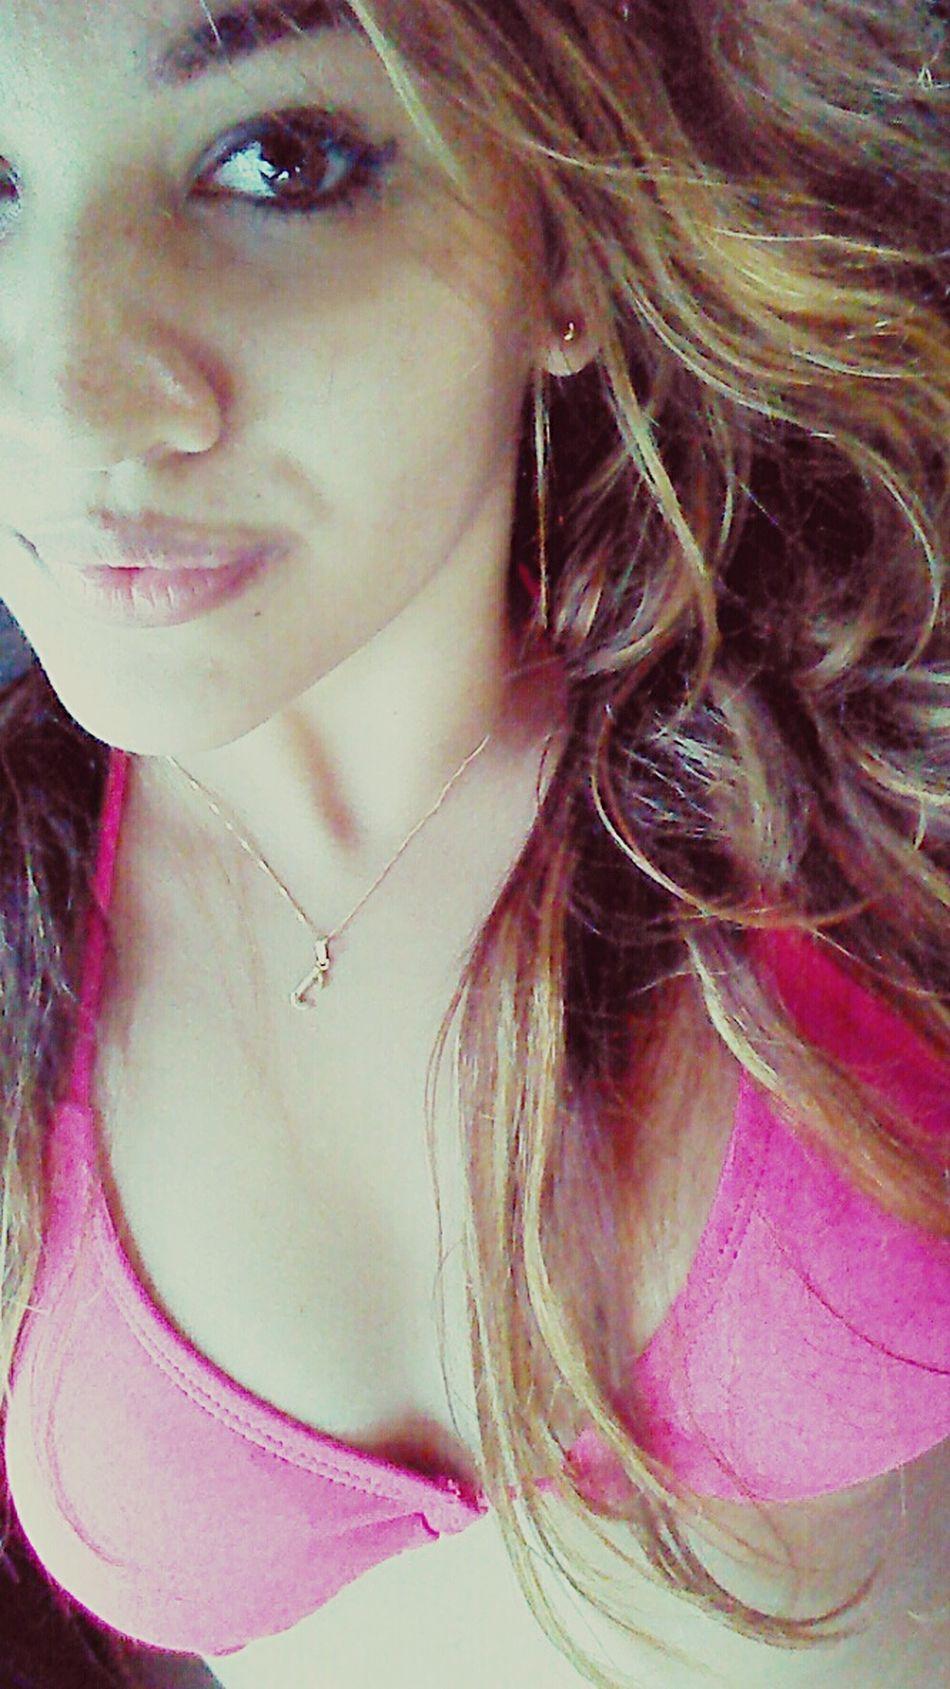 Beach day :) Enjoying The Sun Relaxing Latina ♥ Selfie ✌